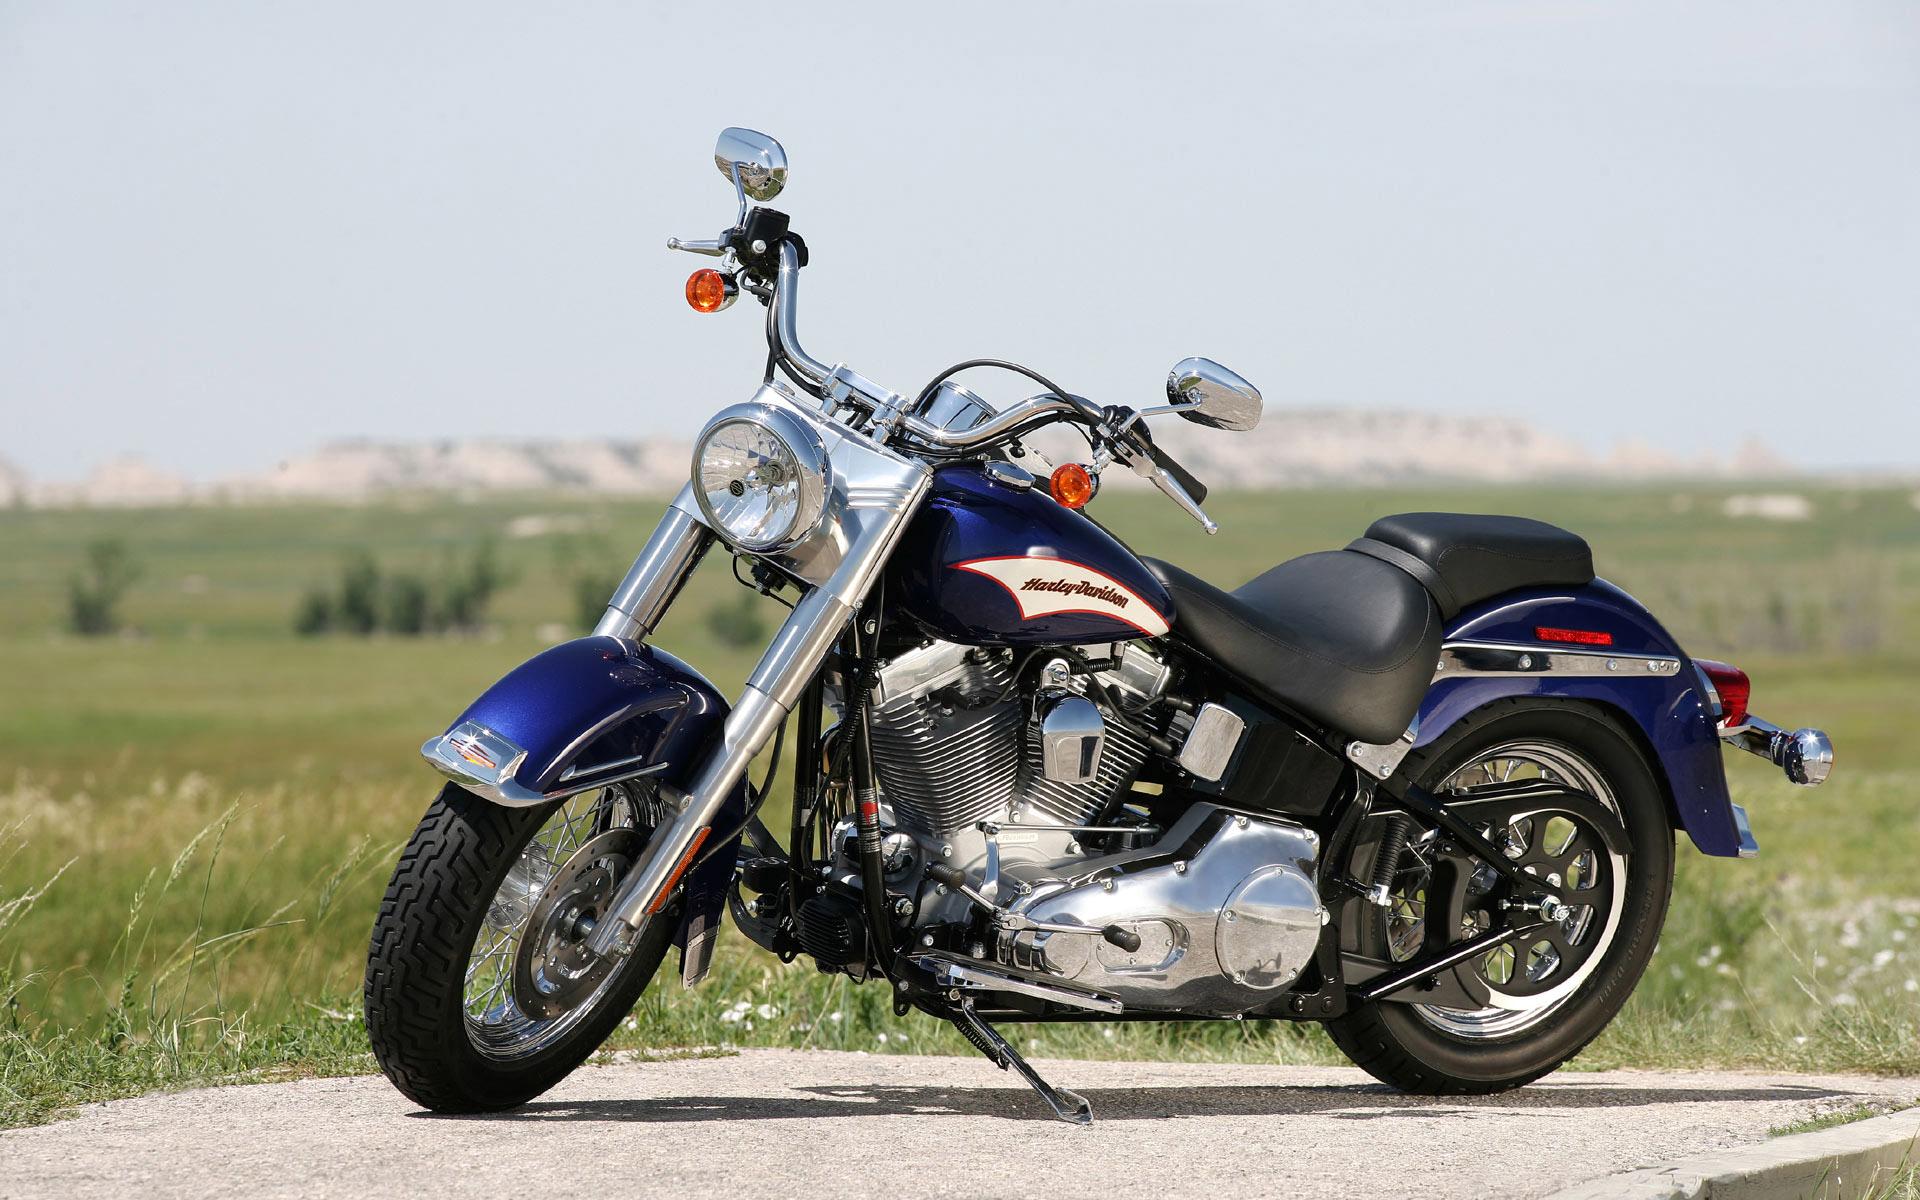 Harley Davidson Motorcycle Wallpaper 21369 Wallpaper 1920x1200